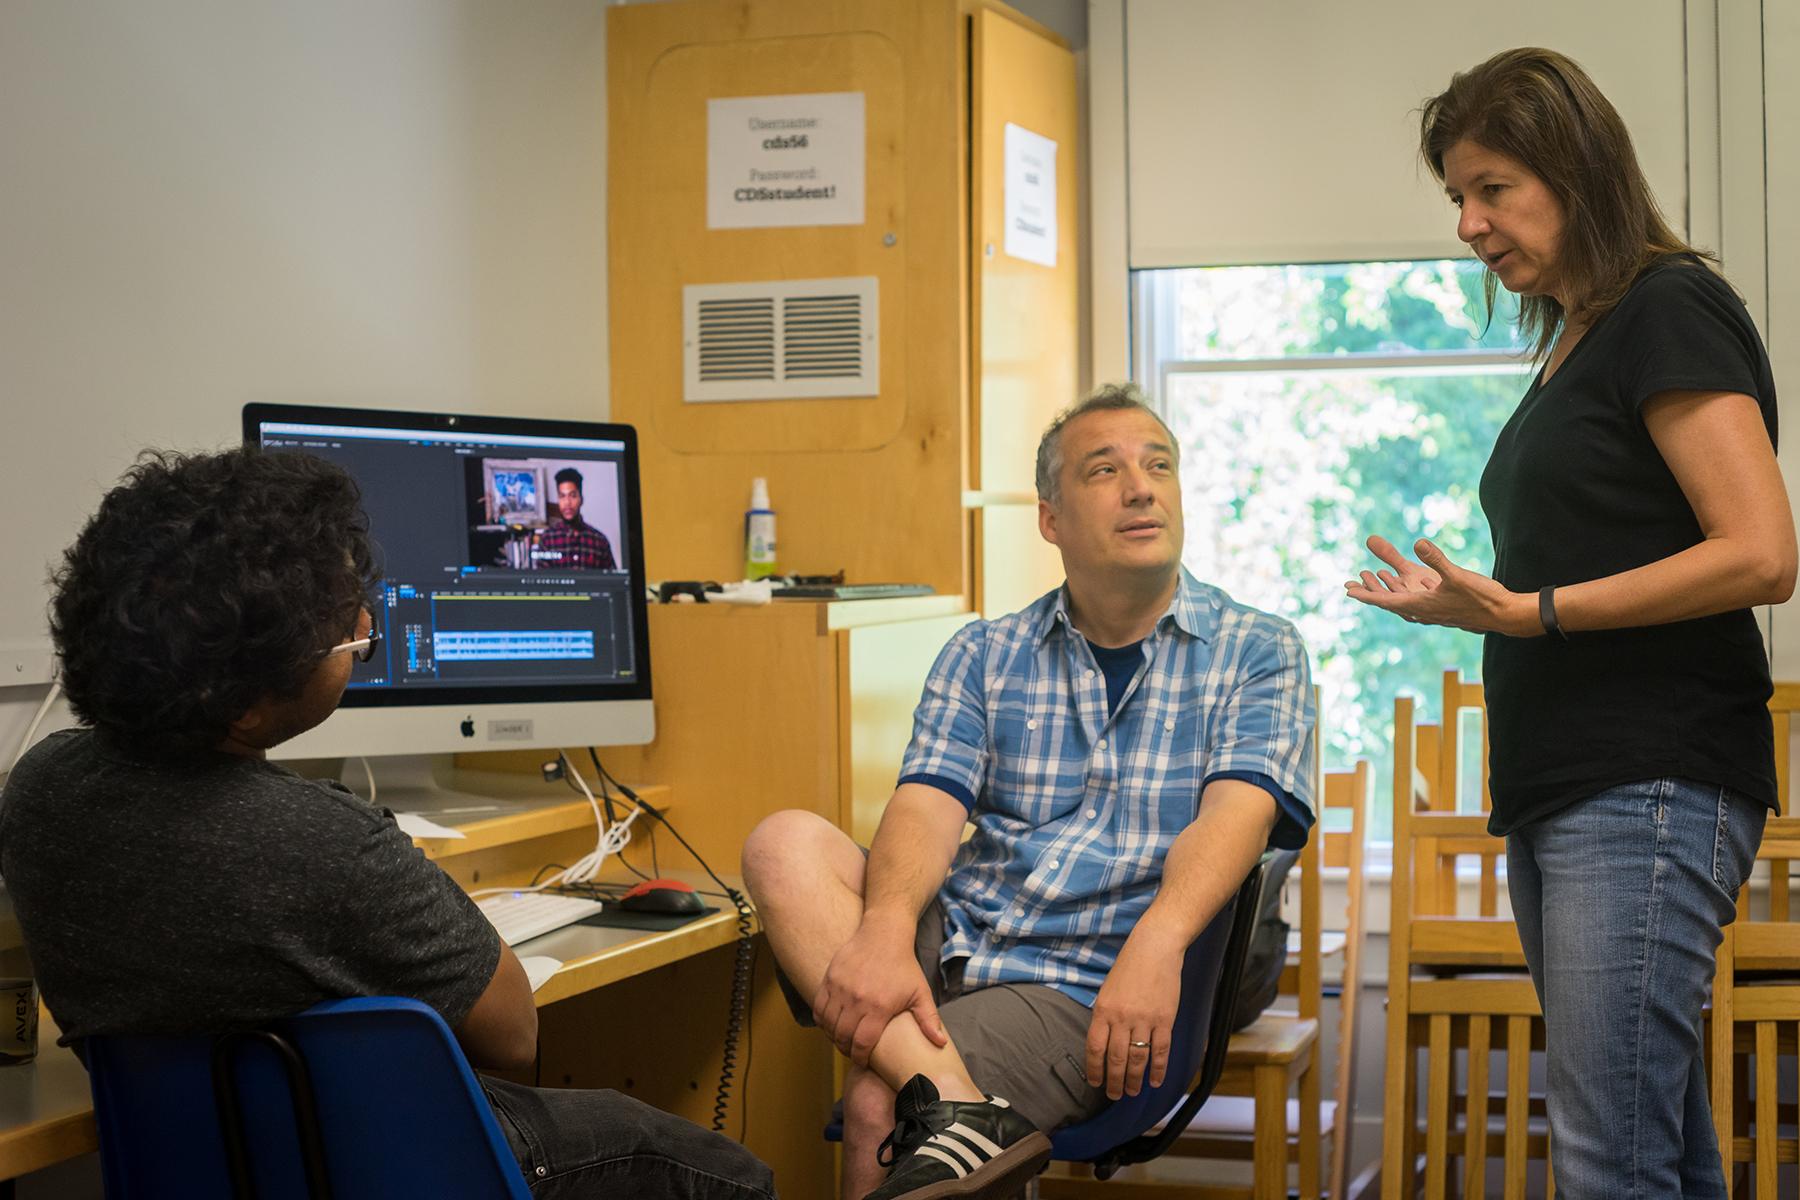 All photos courtesy of Duke University Center for Documentary Studies. Photo by James Balfour.